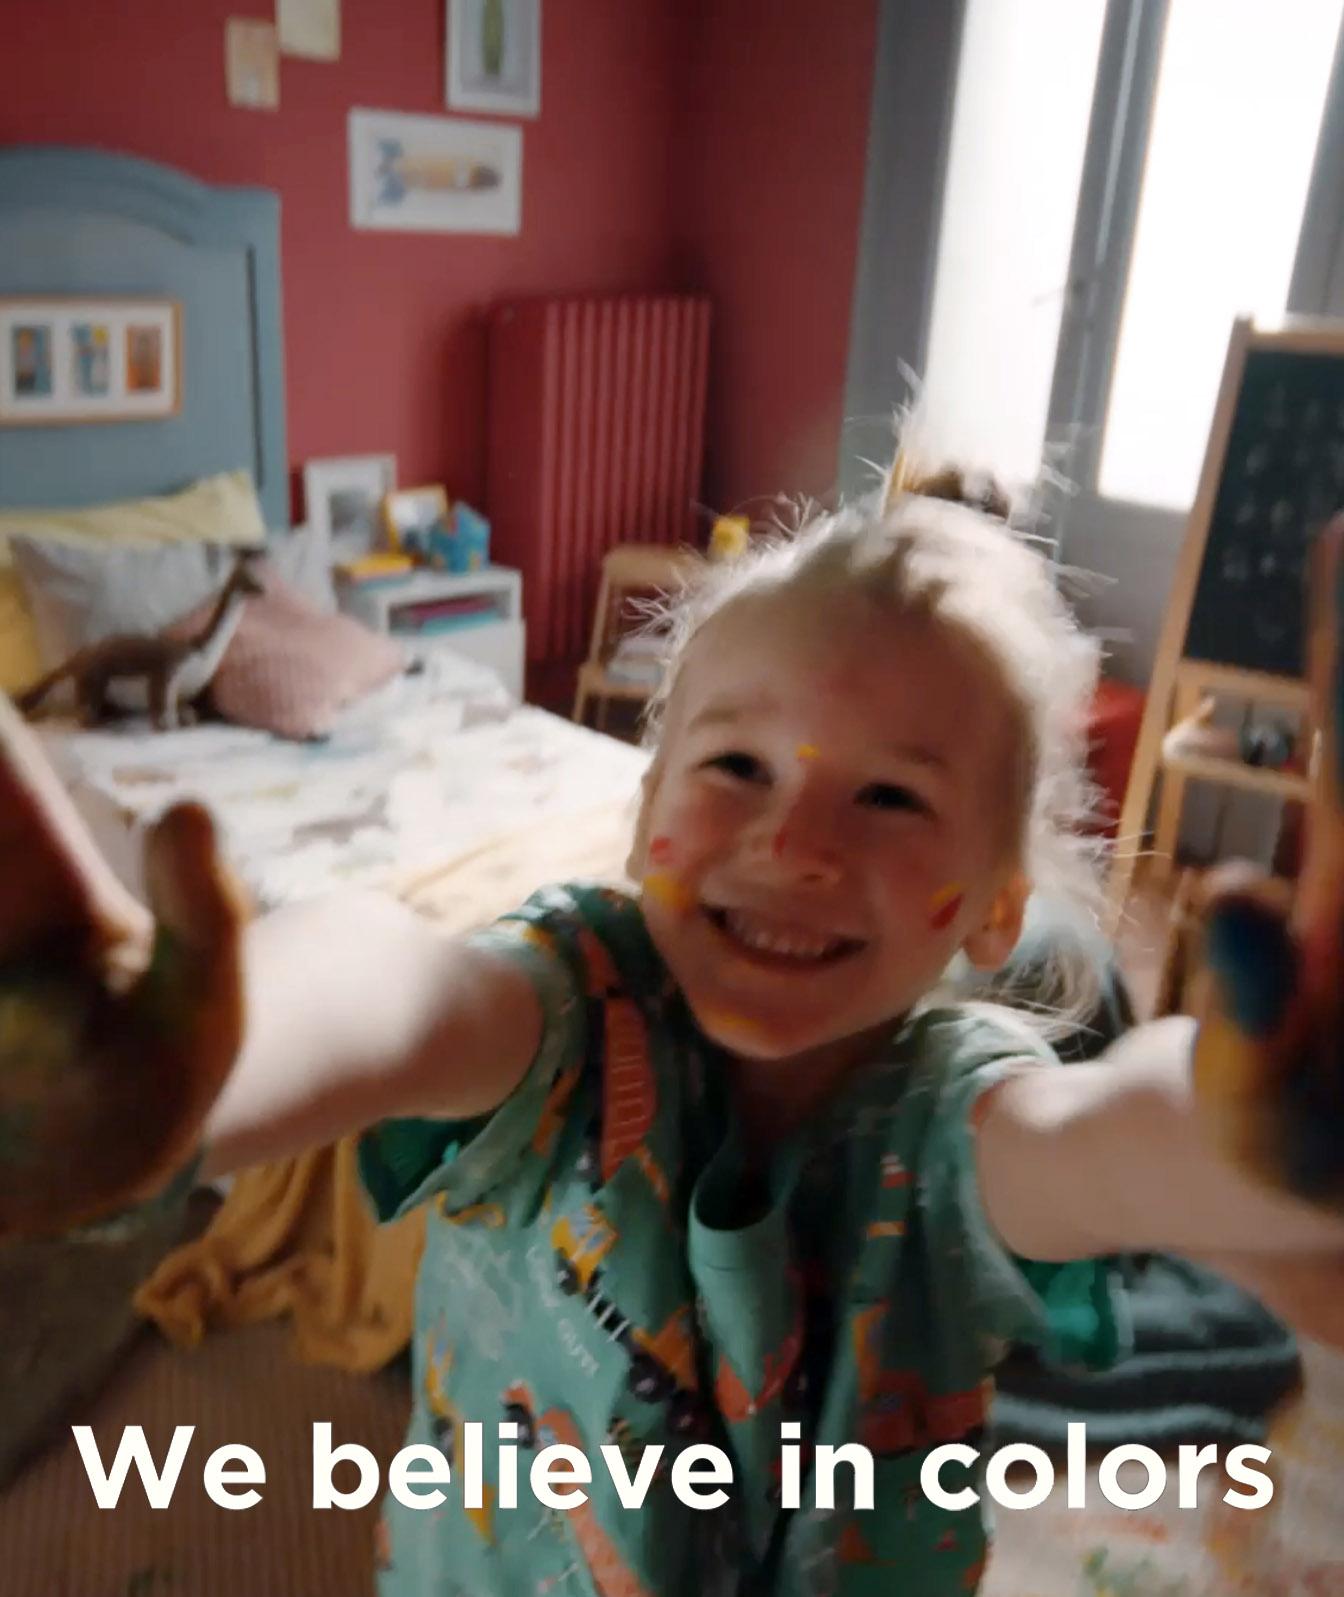 San Marco, we believe in colors